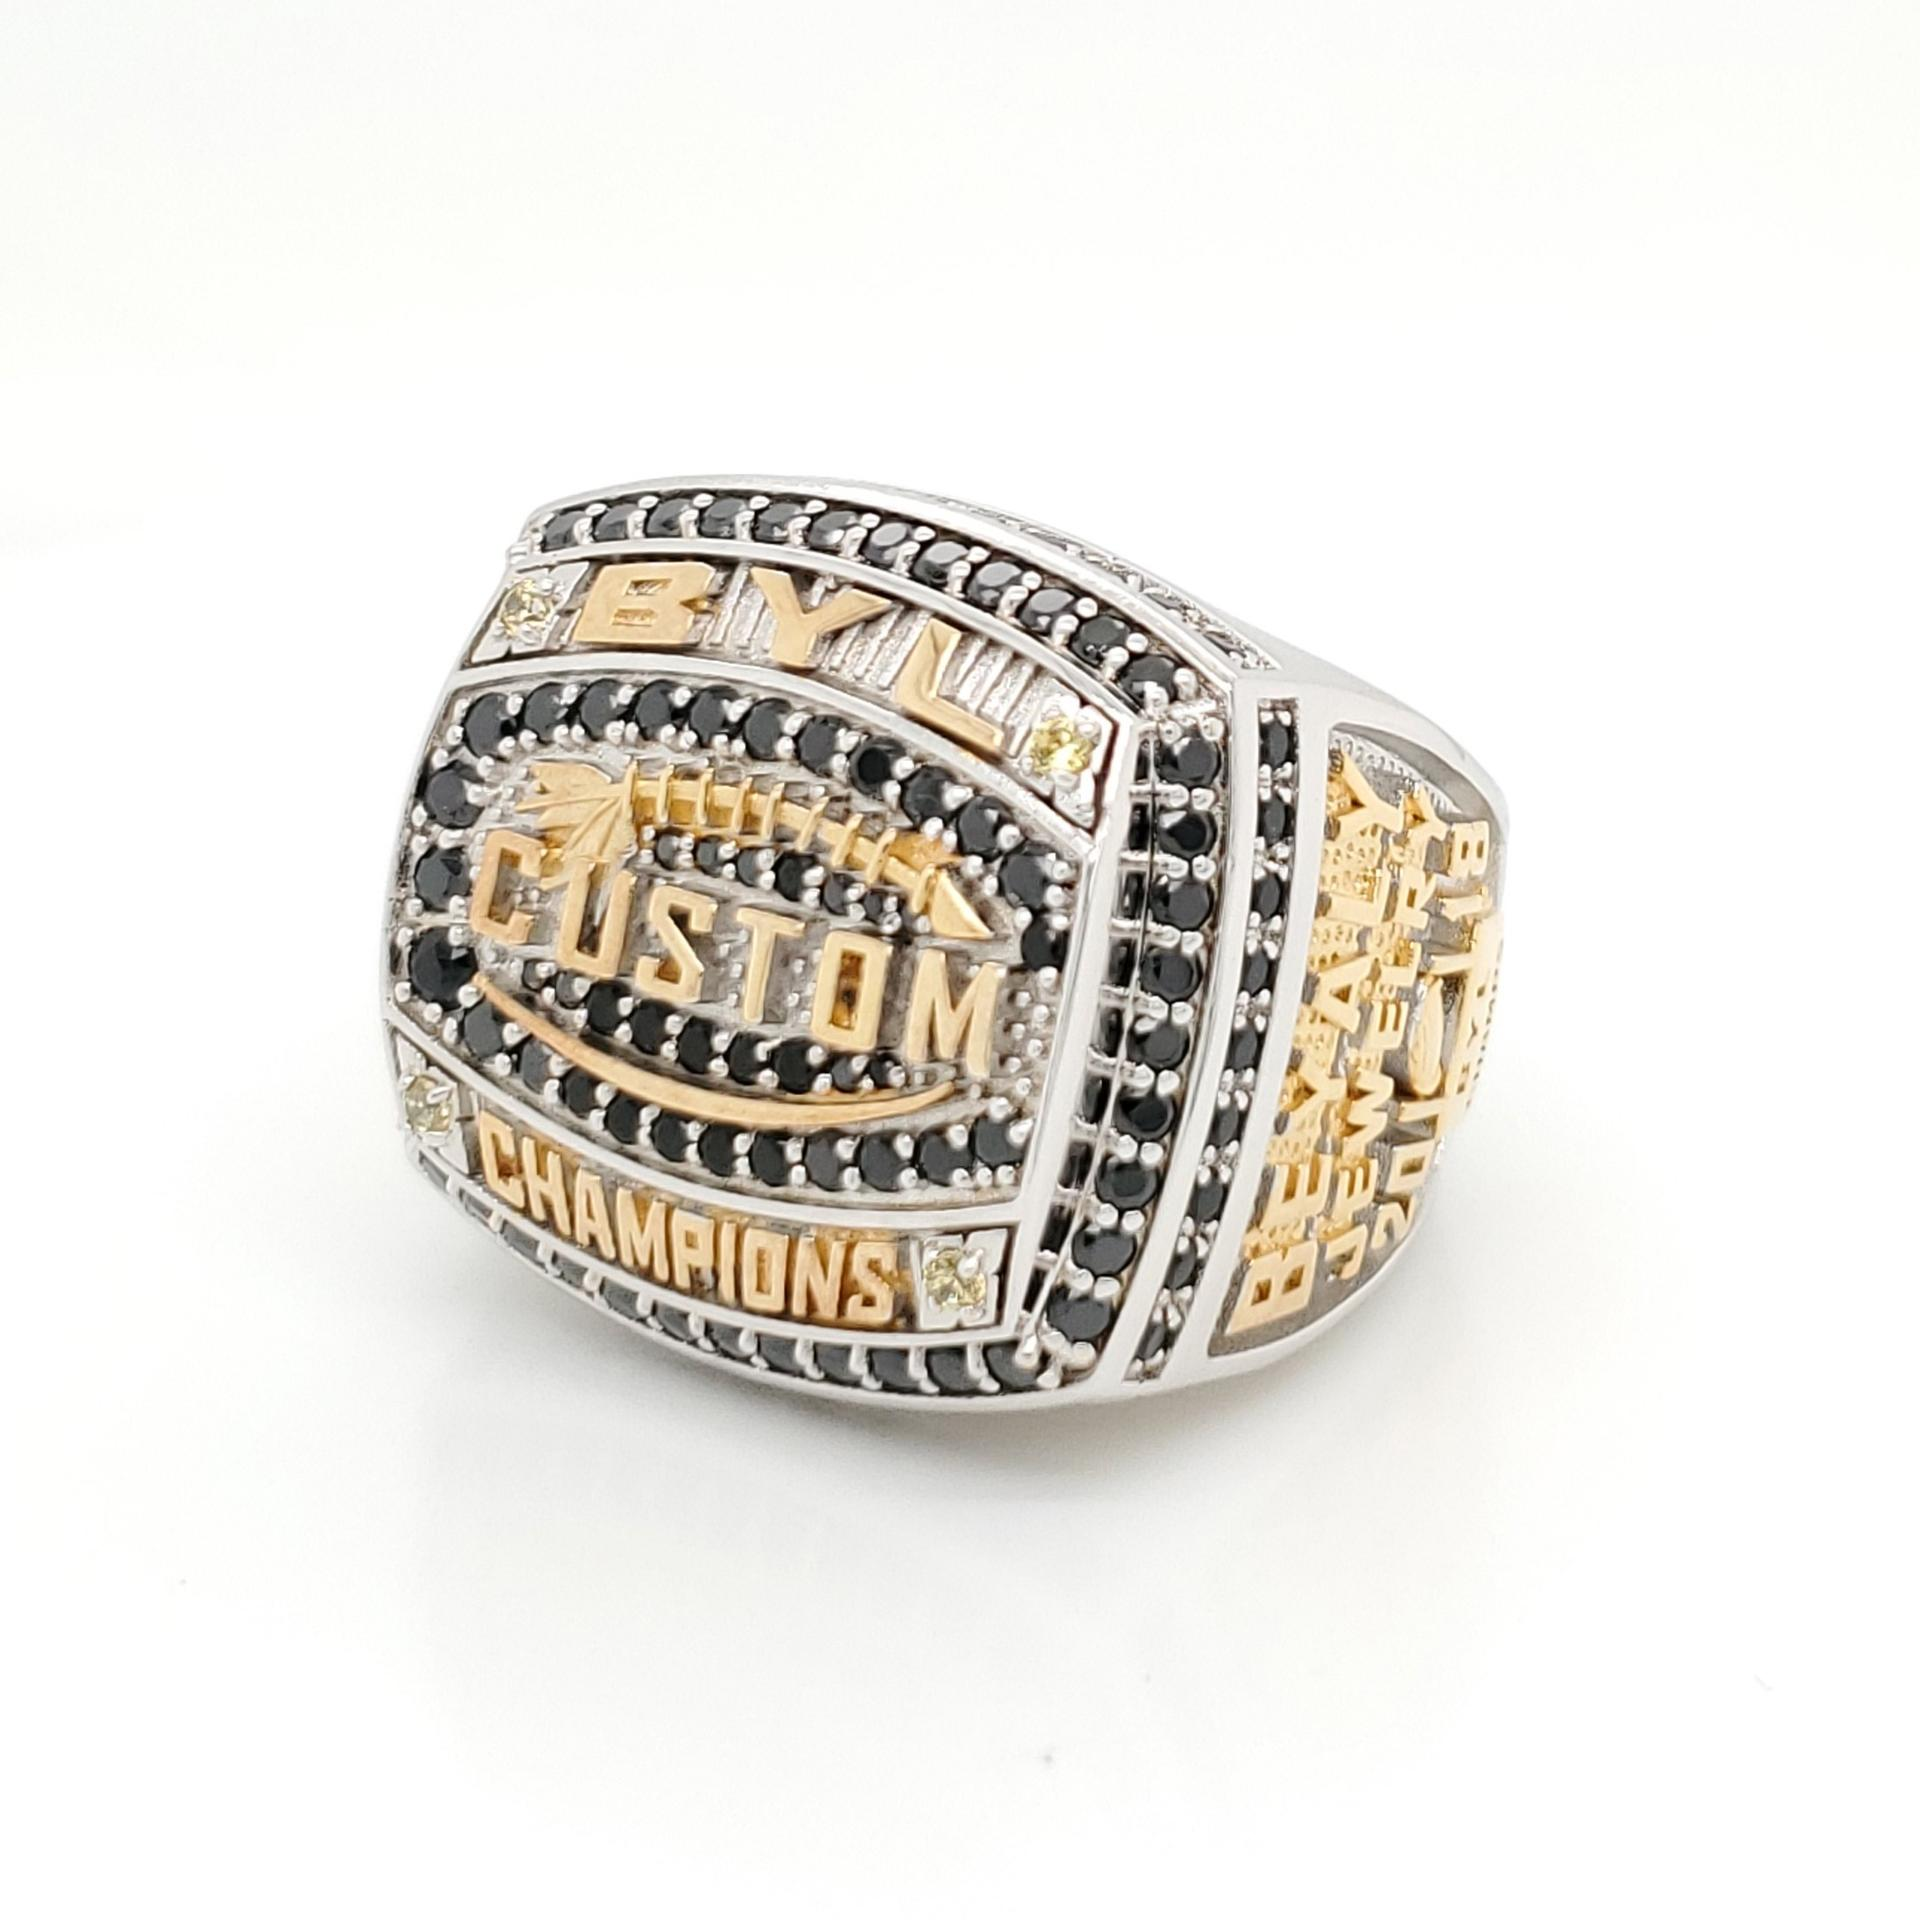 Wholesale replica cz fantasy football championship rings